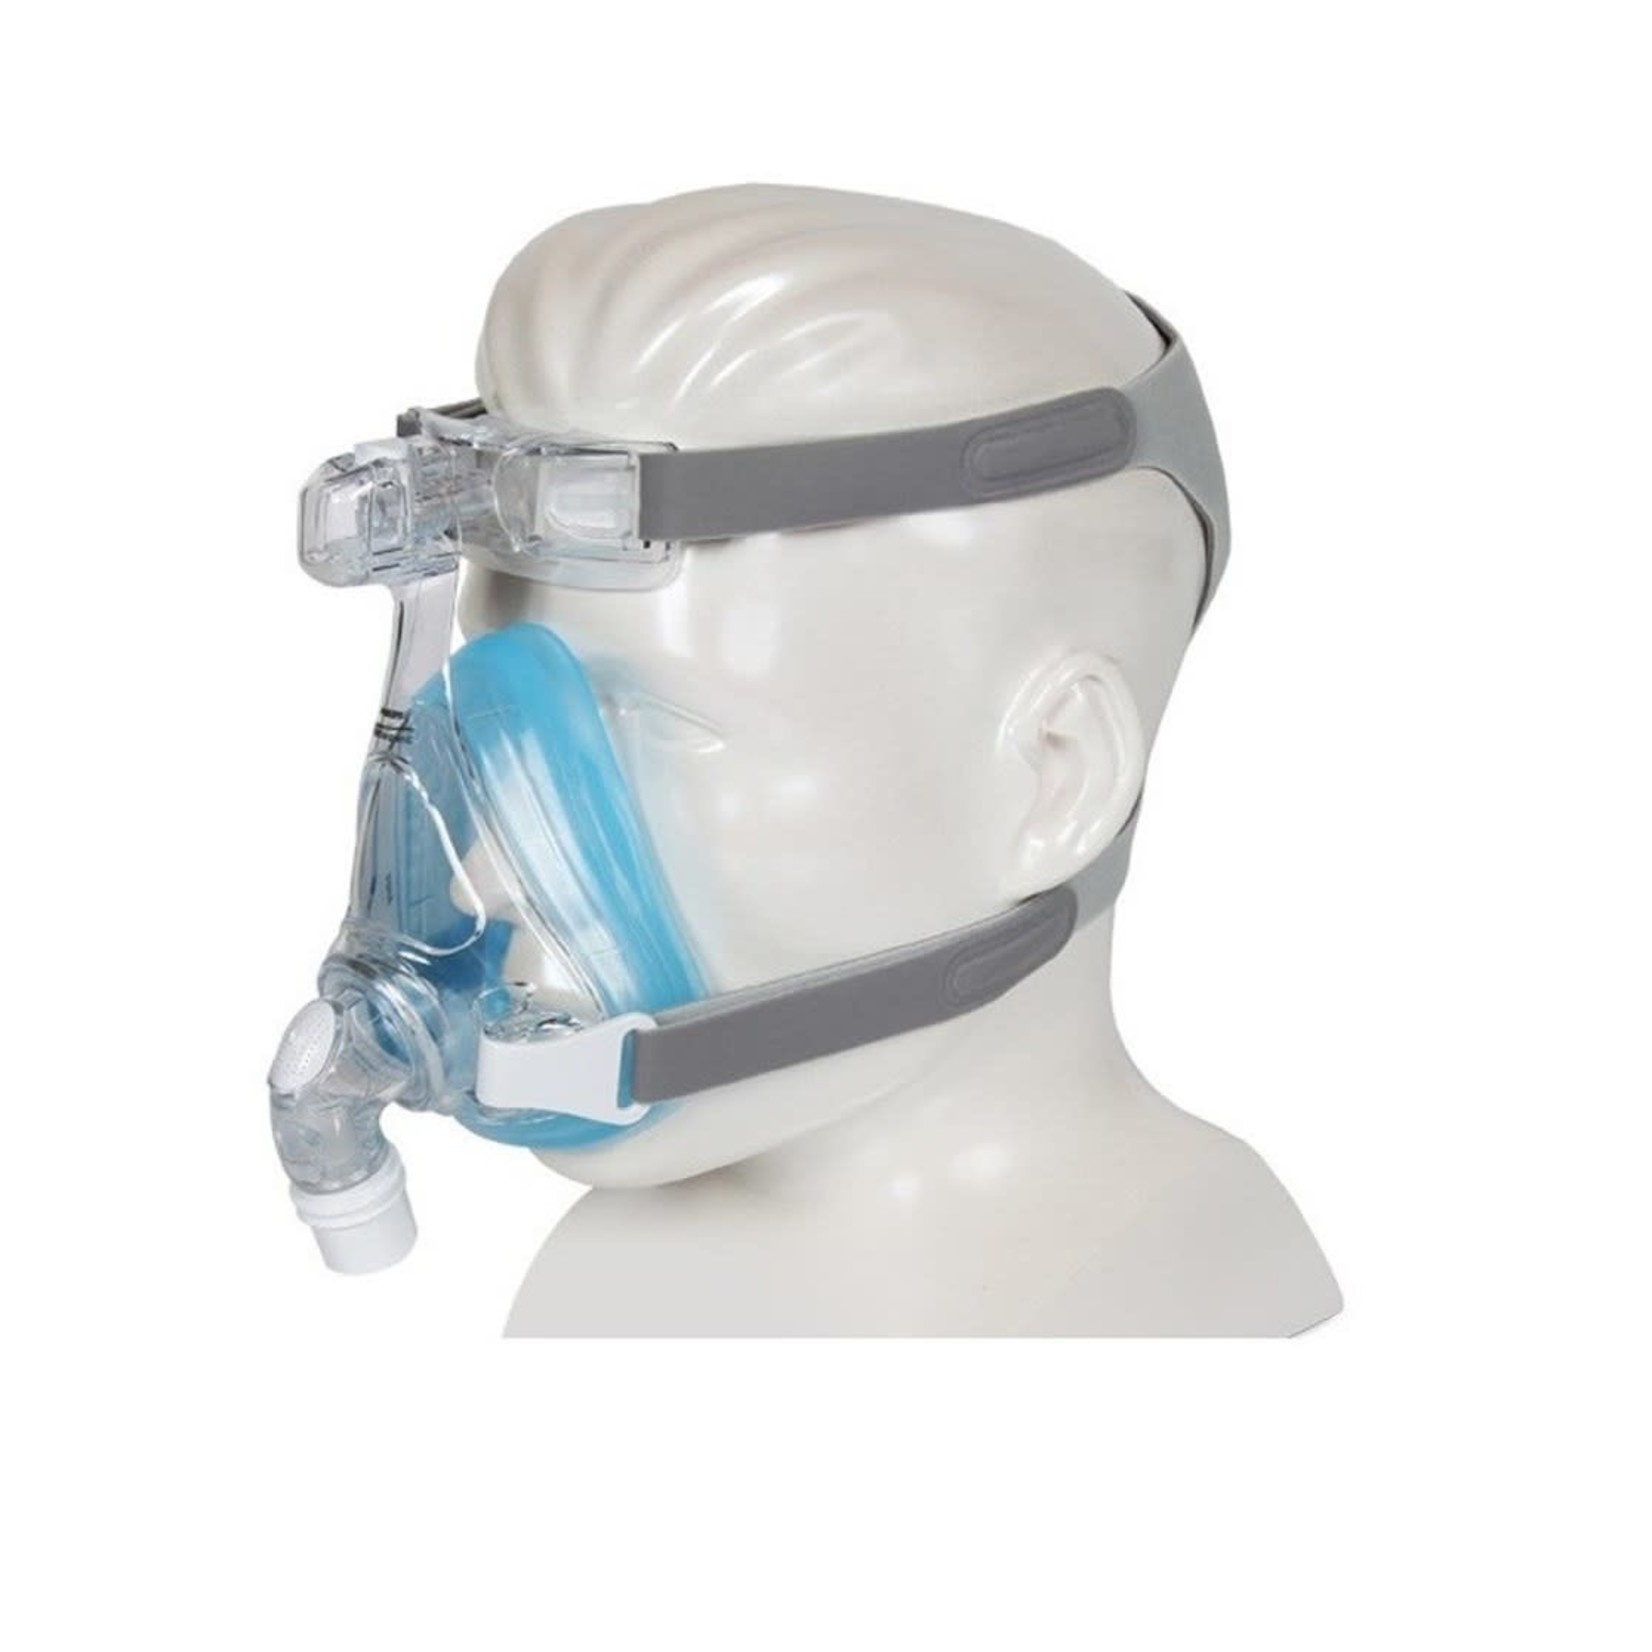 RESPIRONICS Amara Gel Full Face CPAP Mask